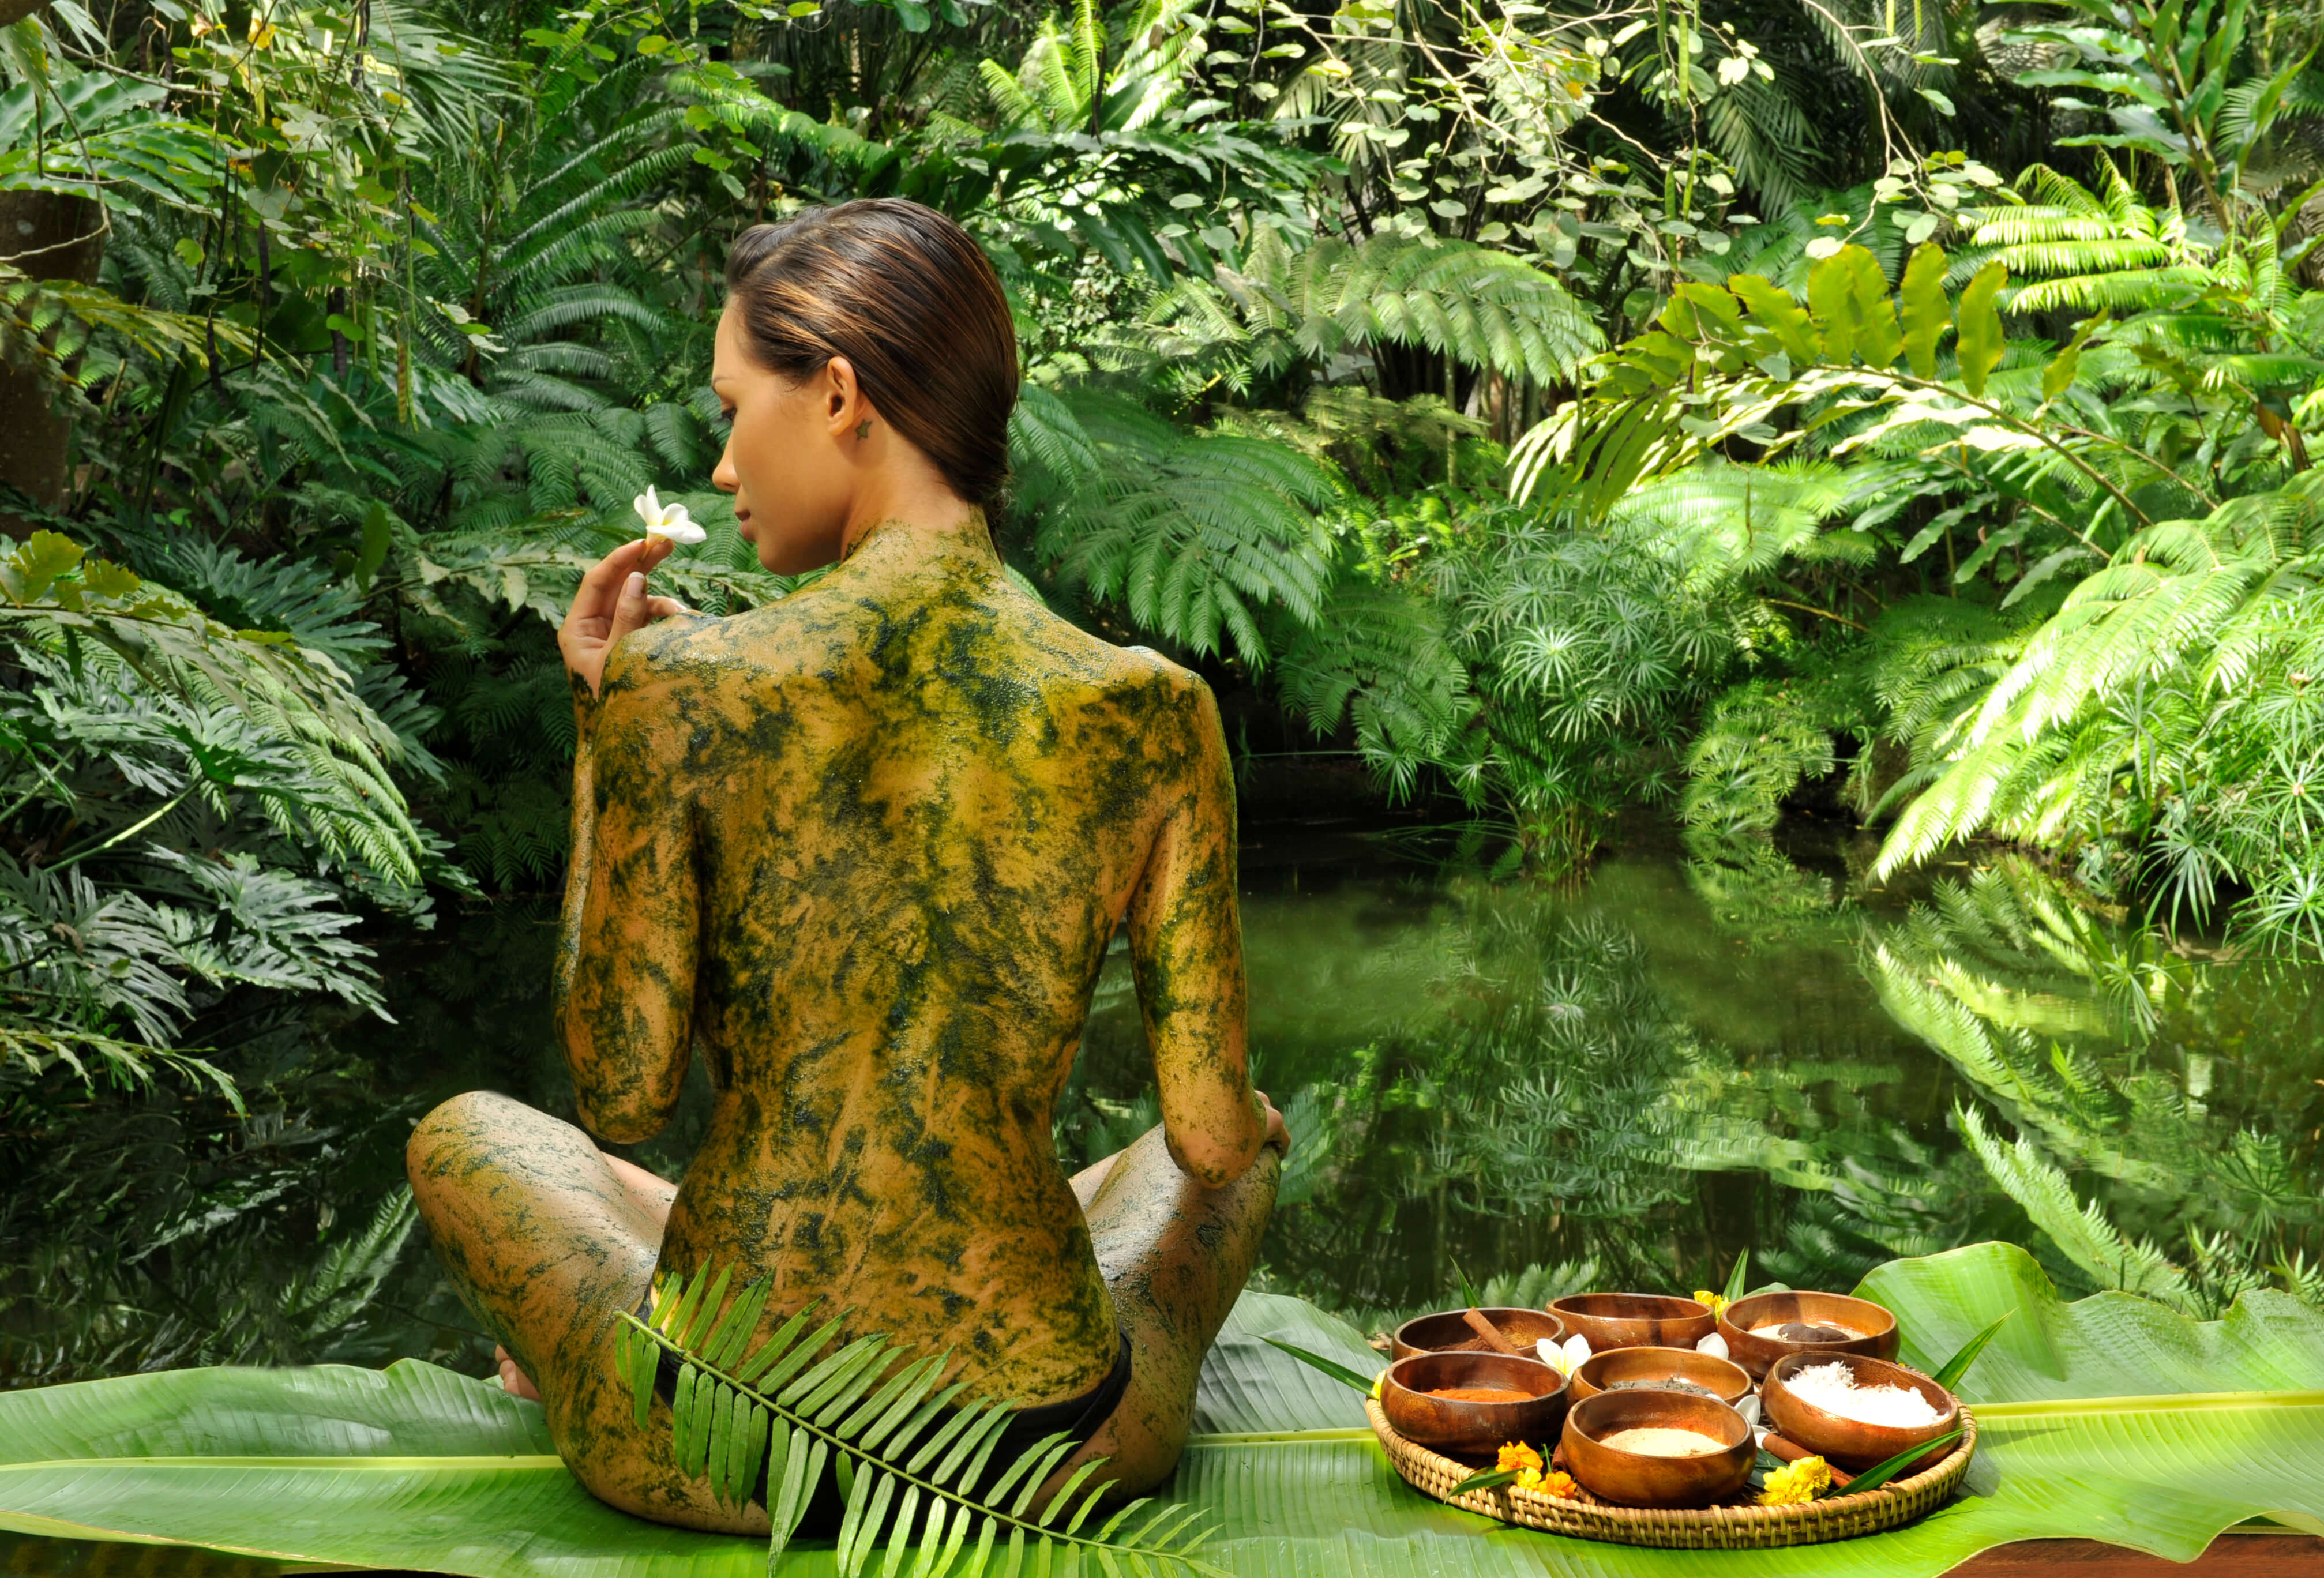 Hotels in Bali | Best Luxury Spas in Bali | Best Vegetarian Restaurants in Bali